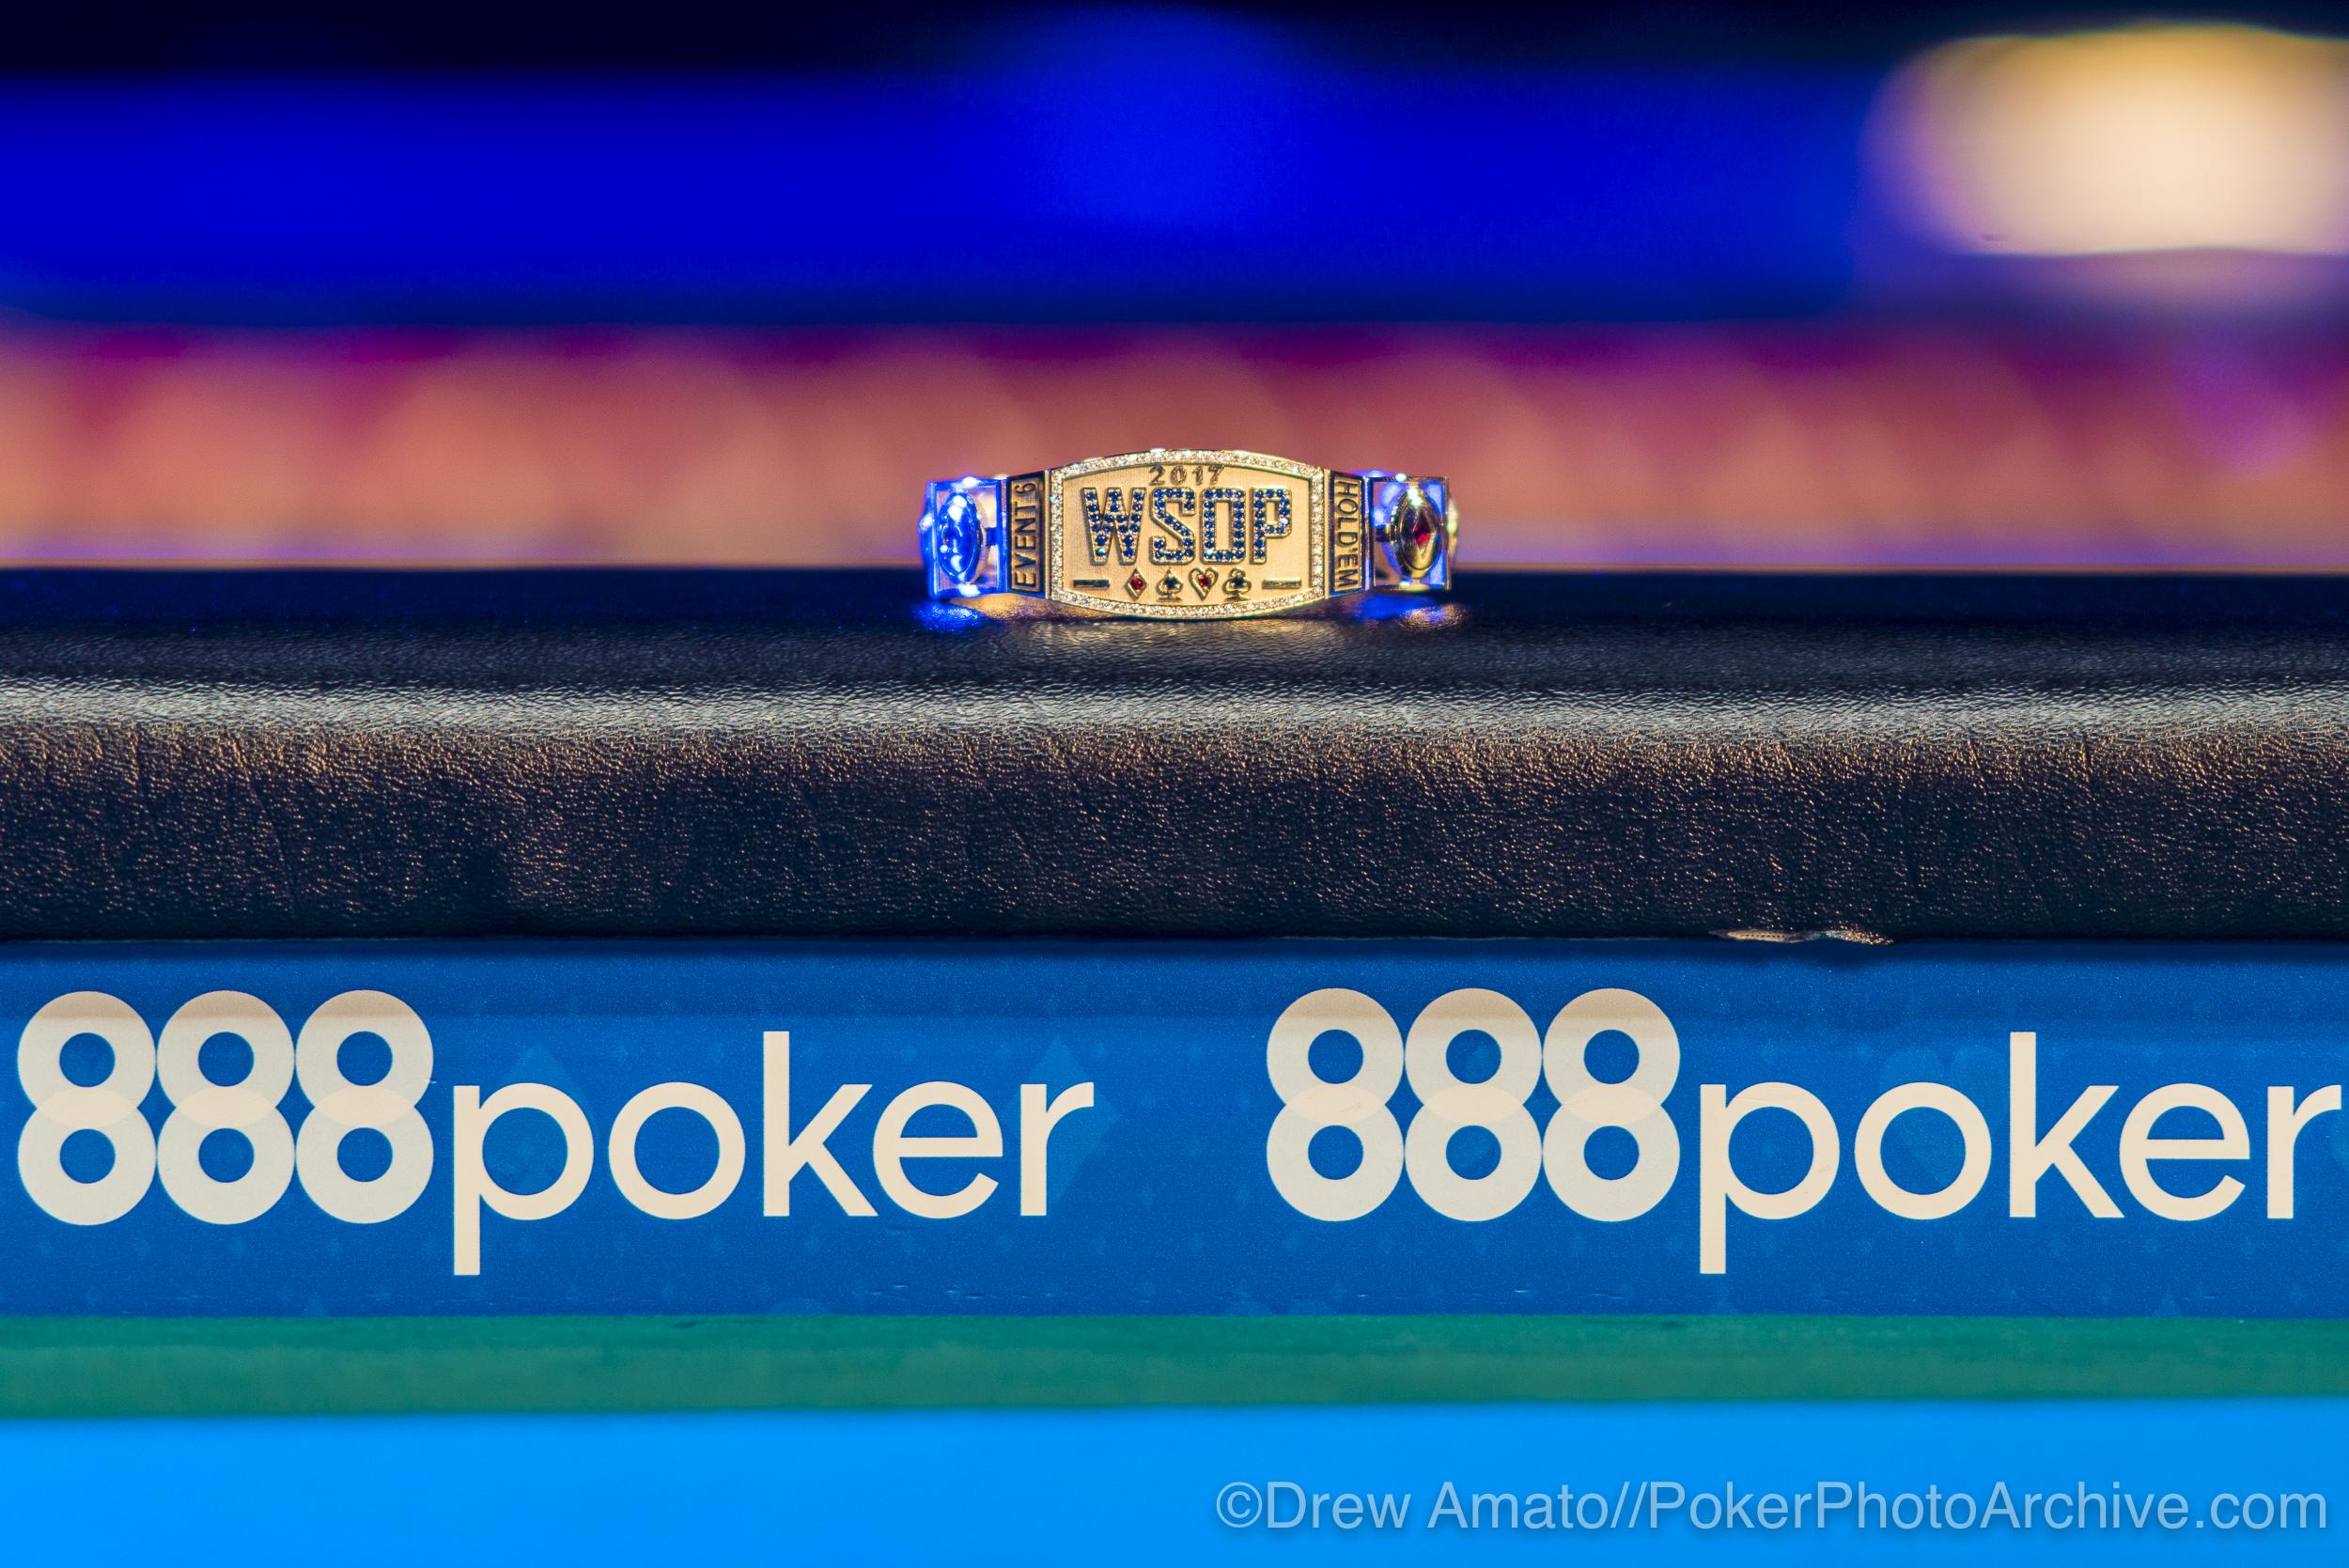 WSOP Bracelet_2017 WSOP_EV010_Day 3_Amato_DA60968.jpg